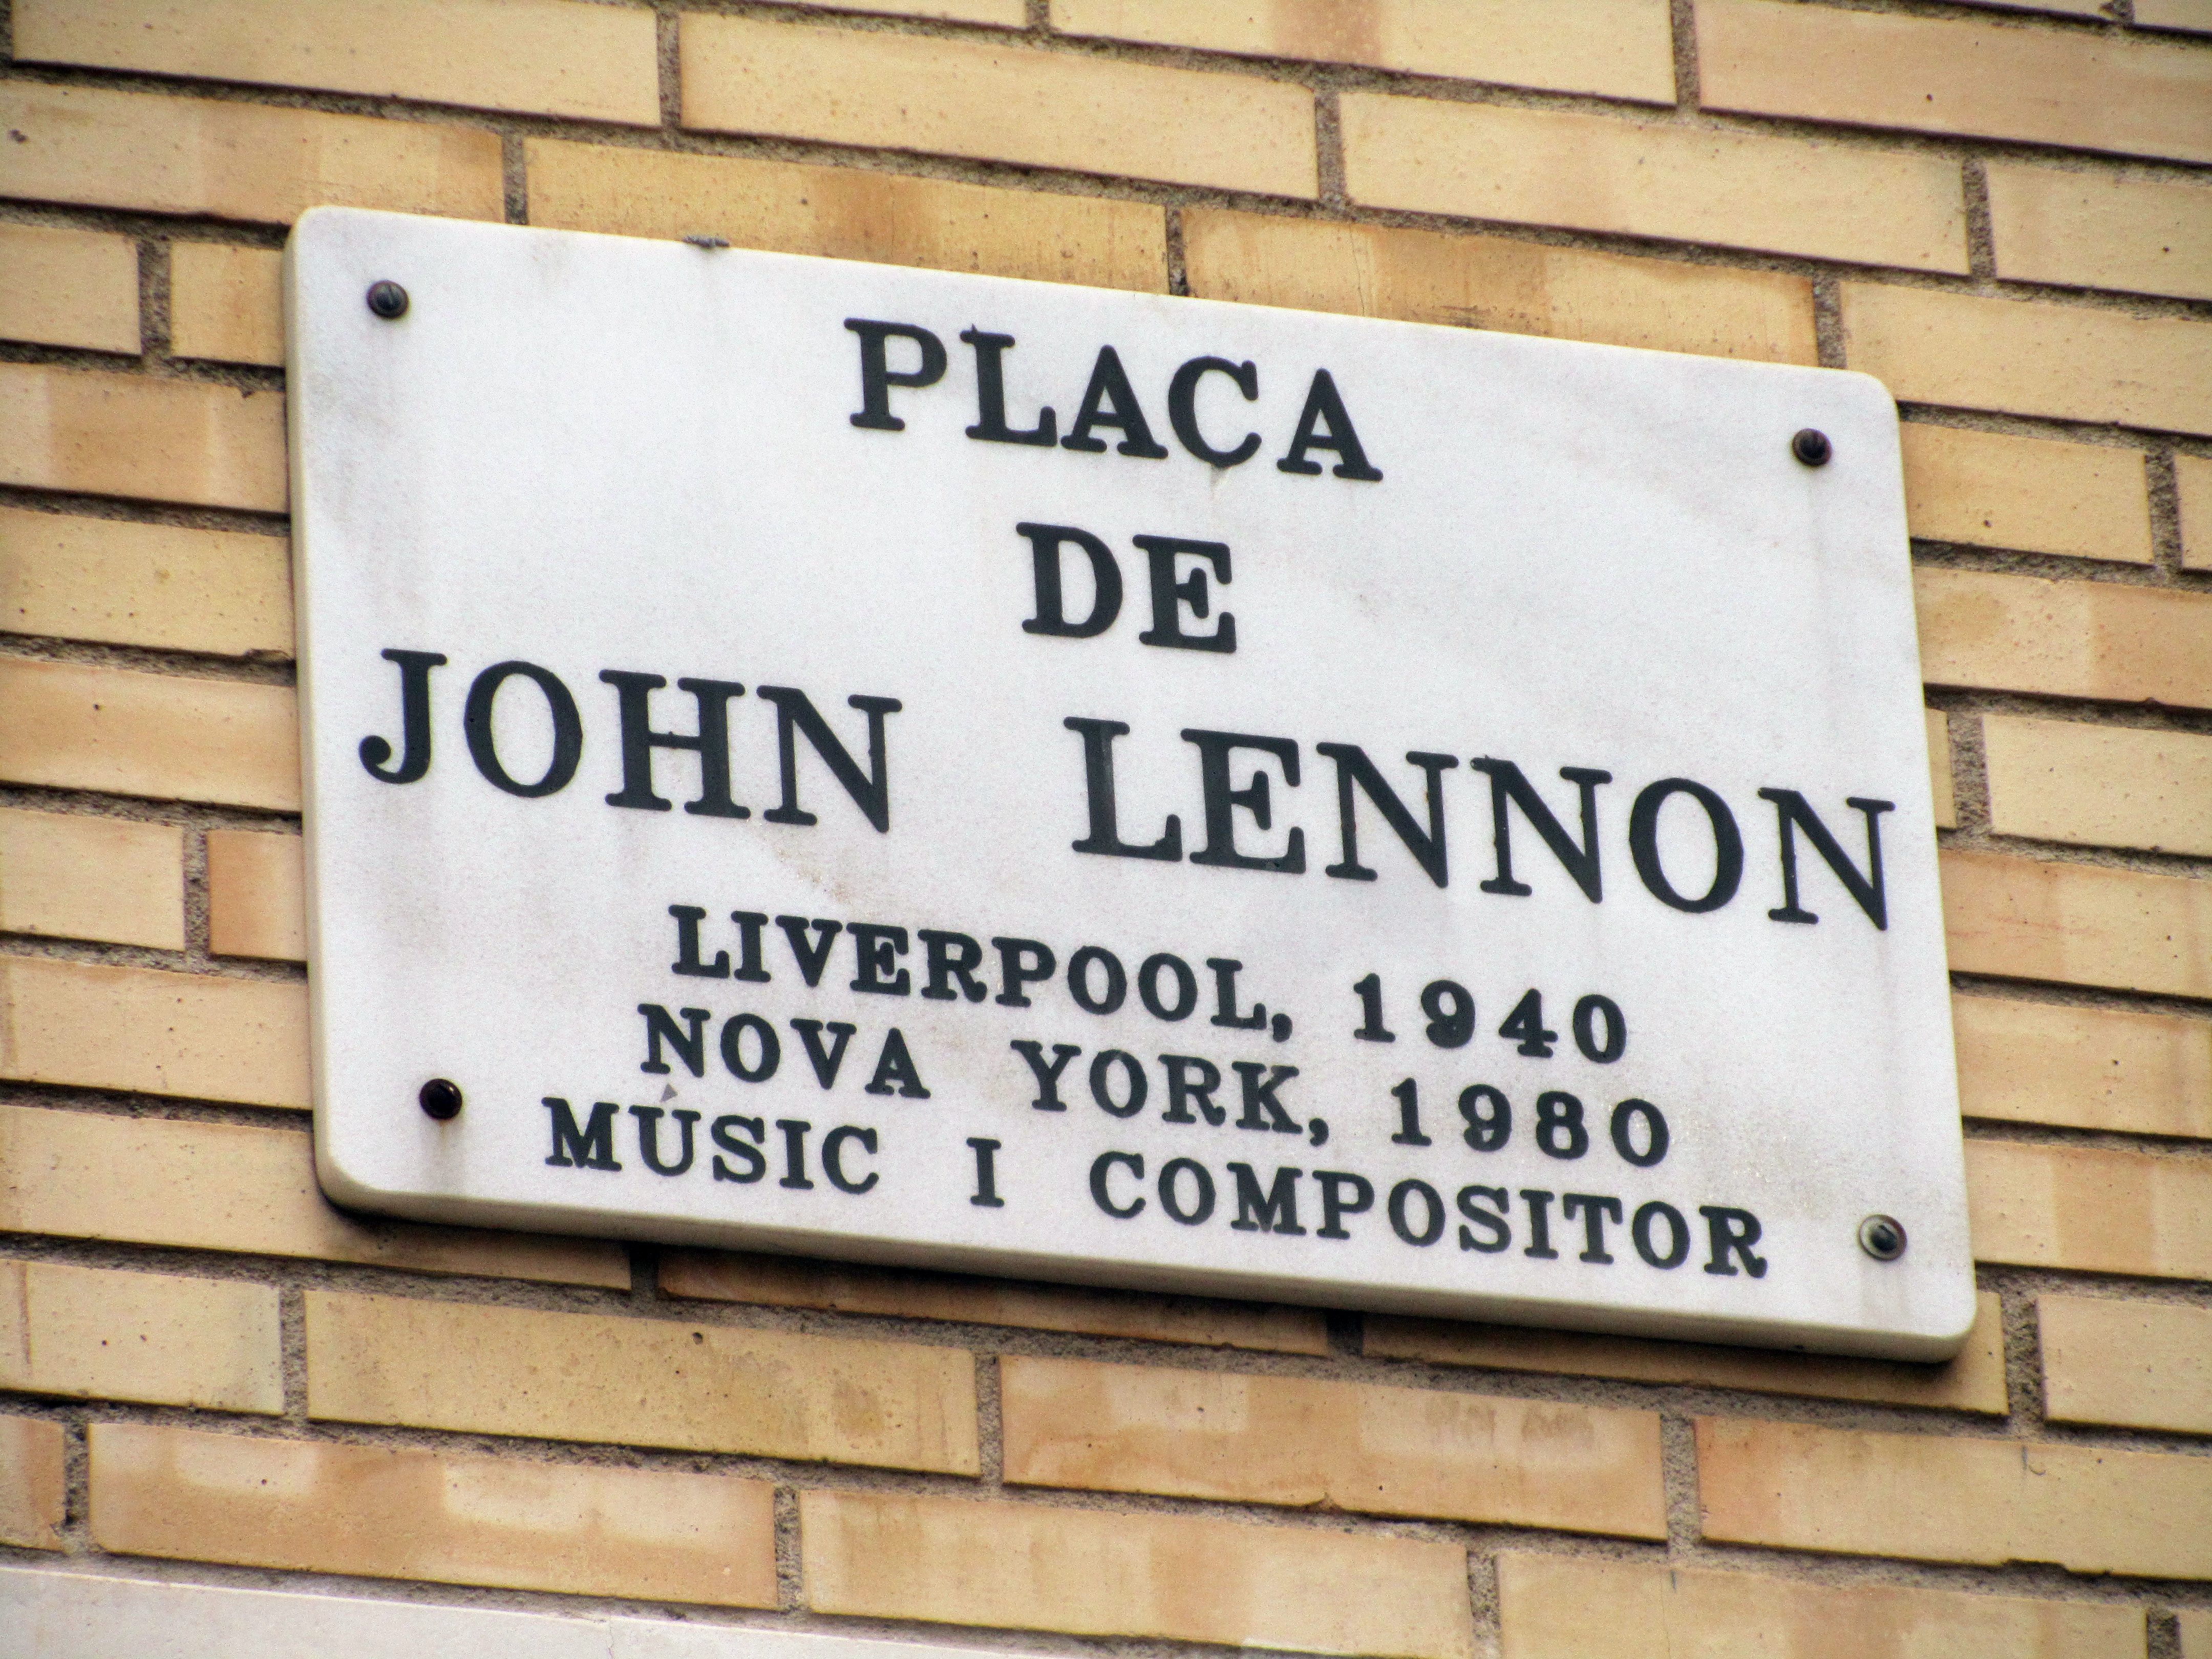 Plaça de John Lennon